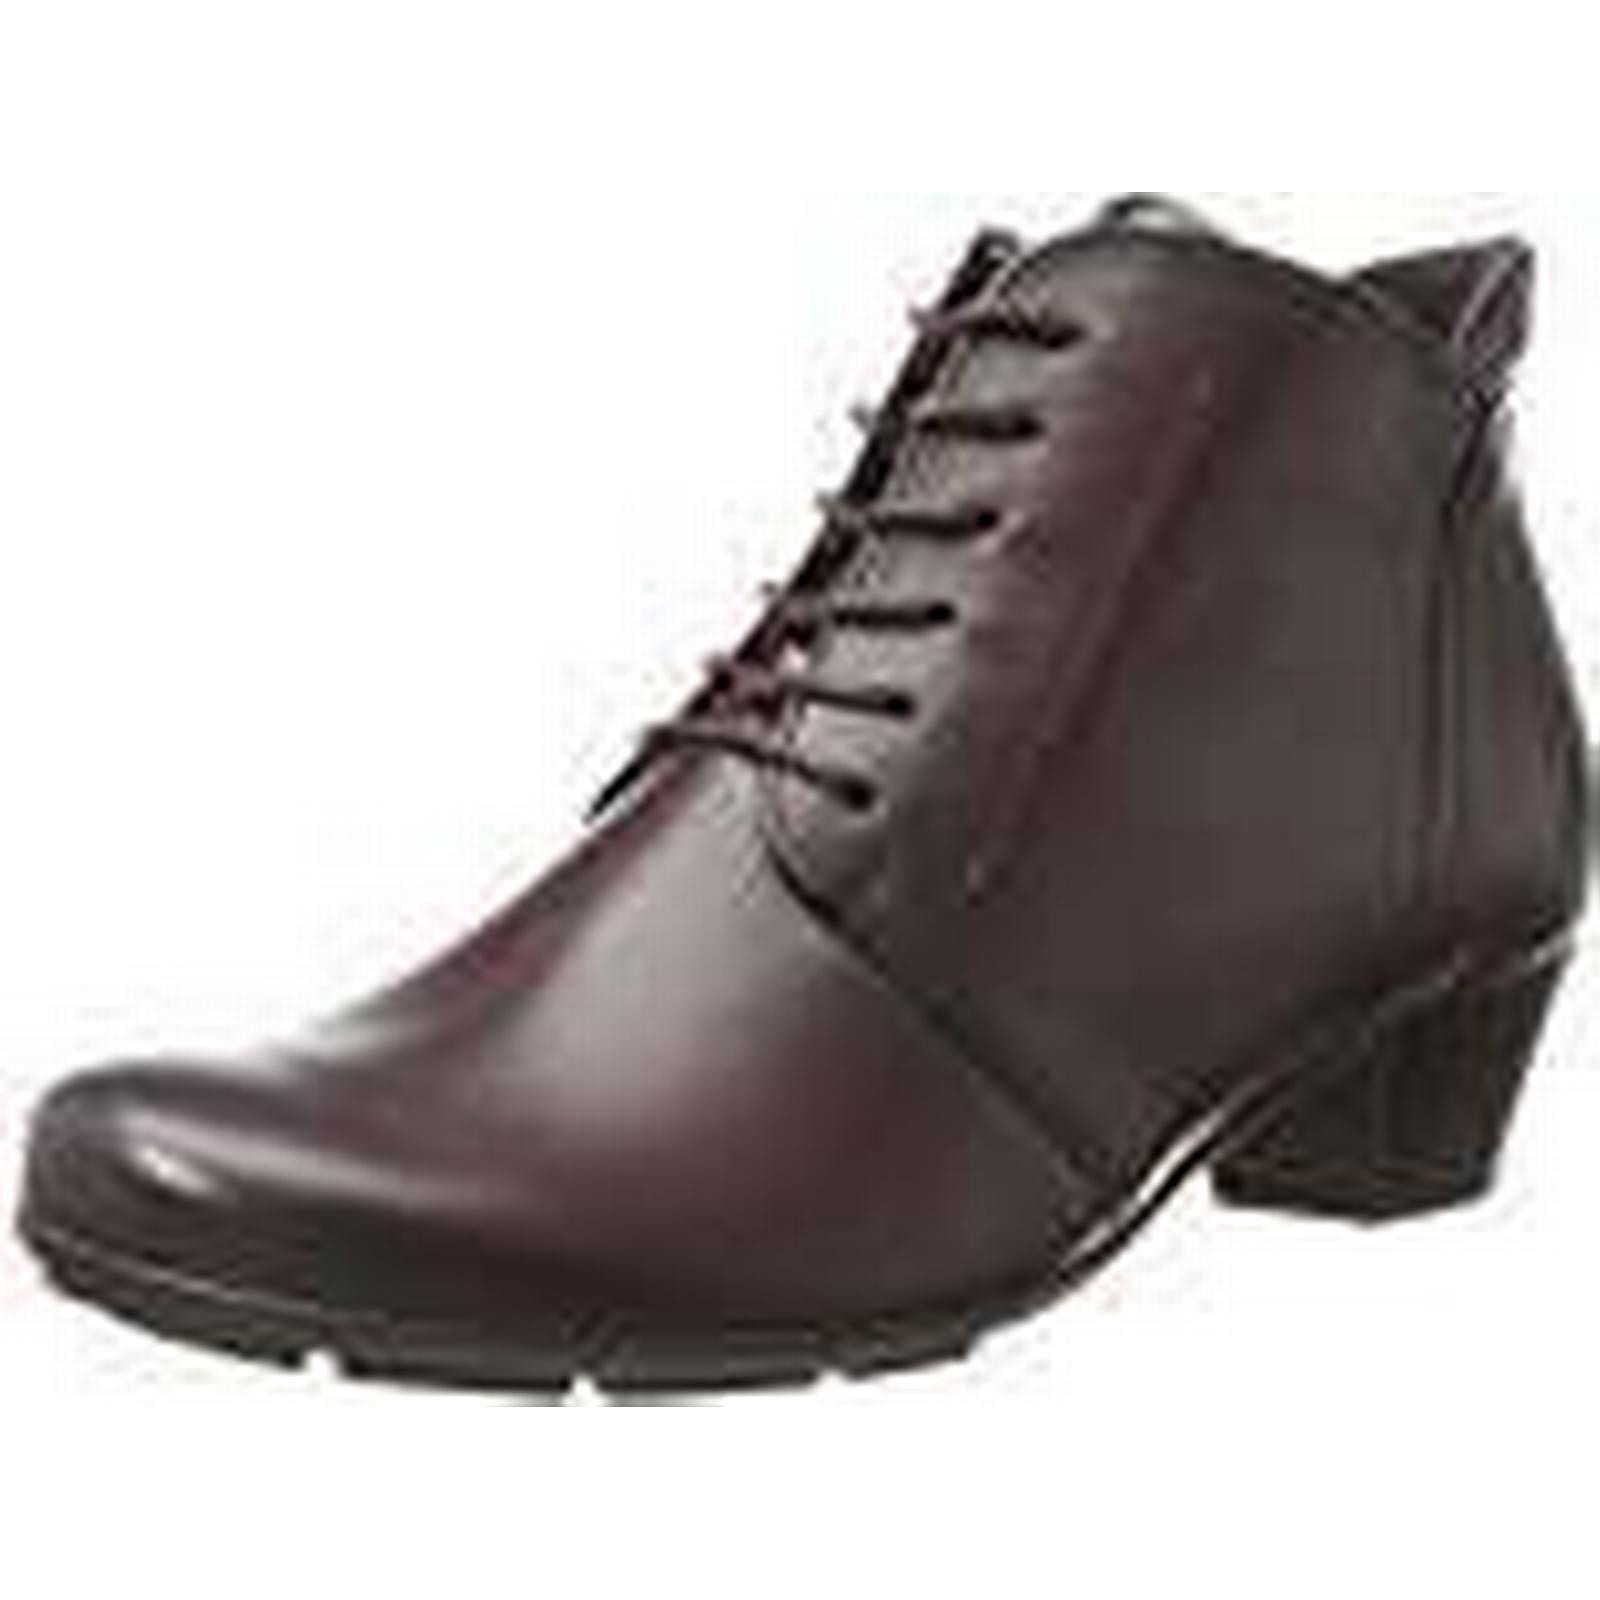 Gabor Mujer Basic botas Rot UK (25 Wine (Effekt) (Effekt) (Effekt) 8 UK Rot 8 UK 8aa82b